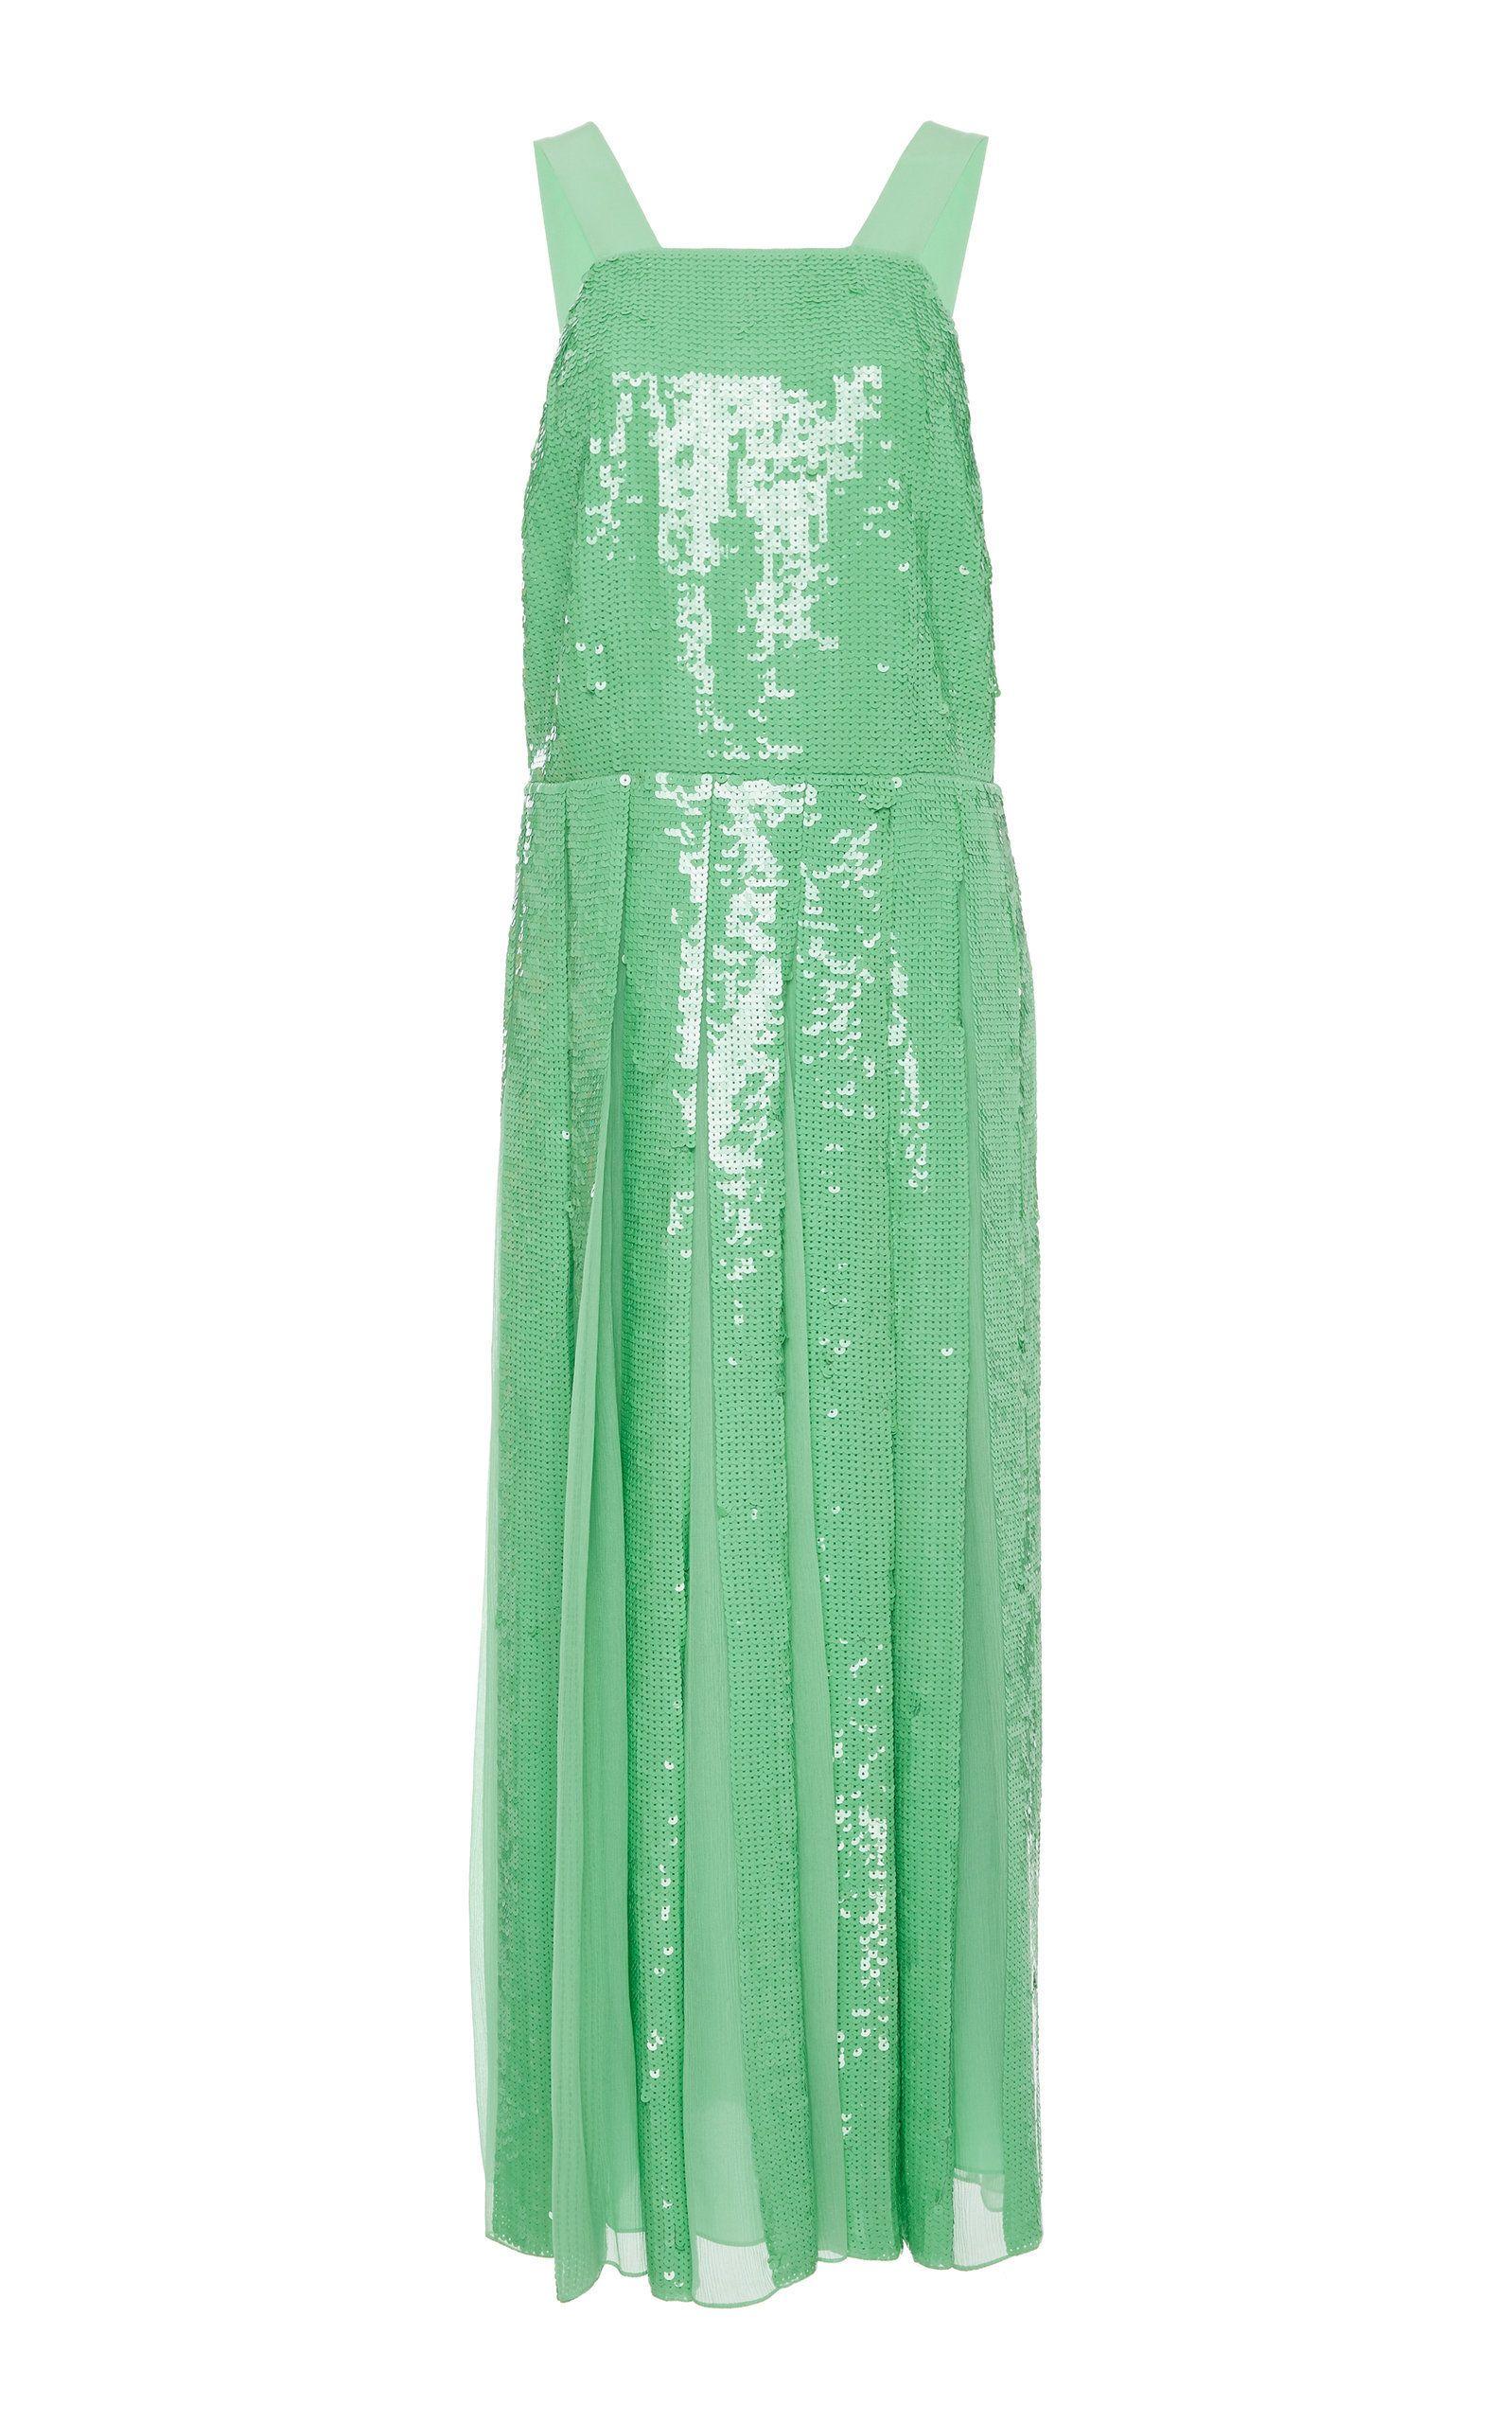 Sequin Overall Dress By Tibi Moda Operandi Overall Dress Dresses Fashion [ 2560 x 1598 Pixel ]